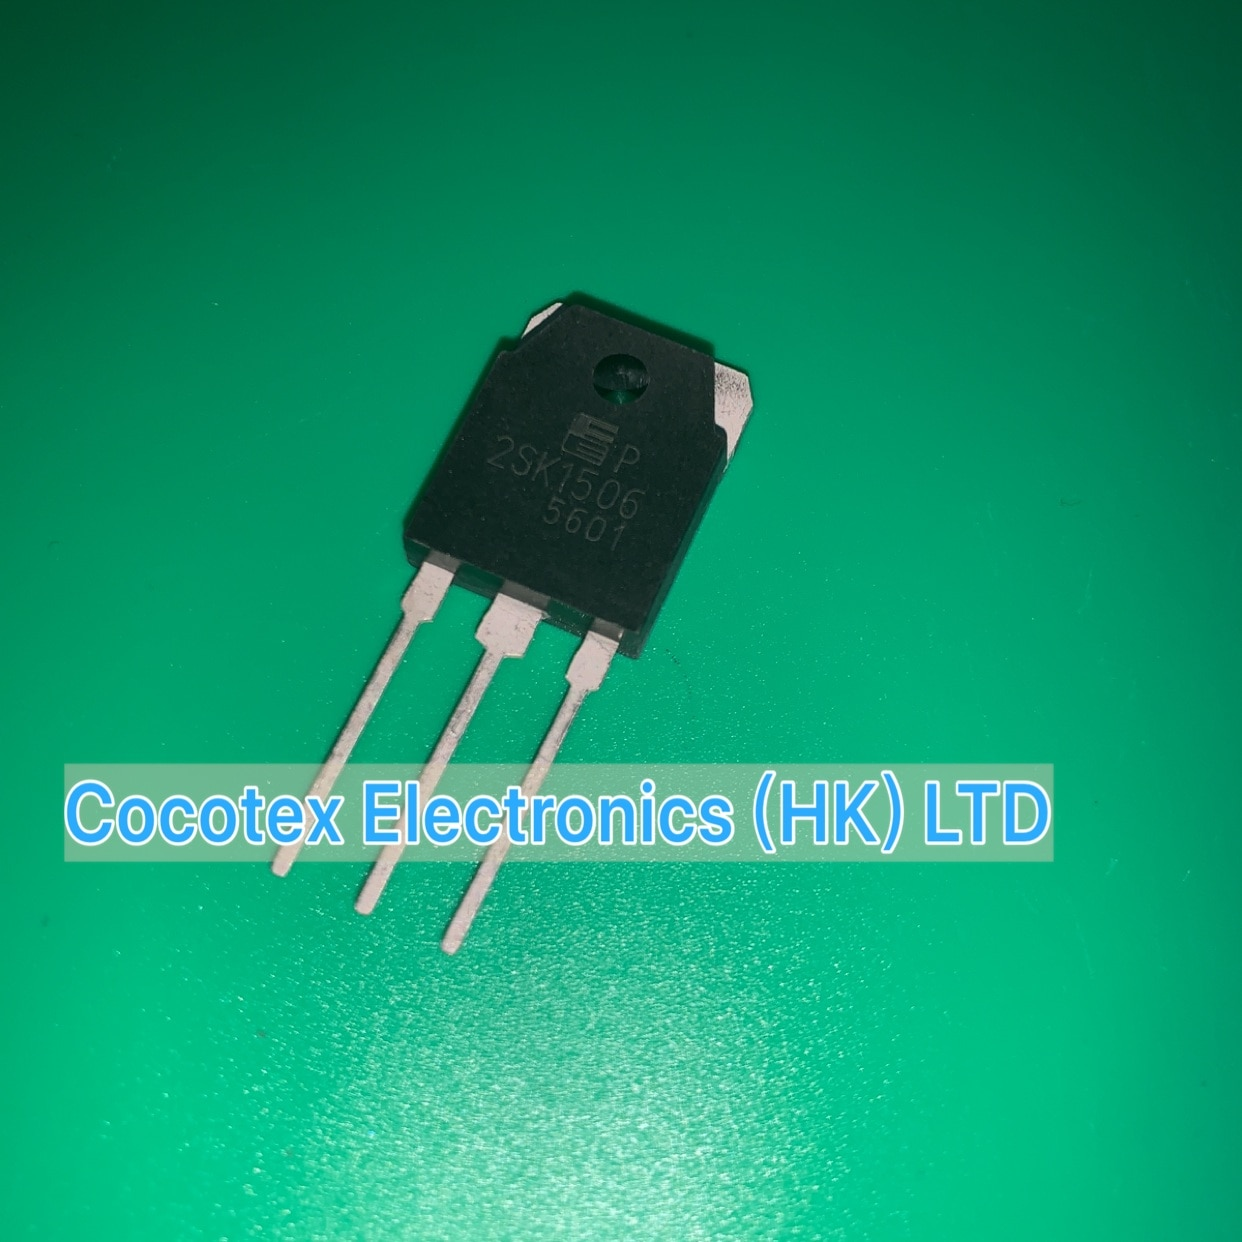 10 unids/lote 2SK1506-220 2S K1506 N-CHANNEL del MOSFET de potencia TO220 2SK 1506